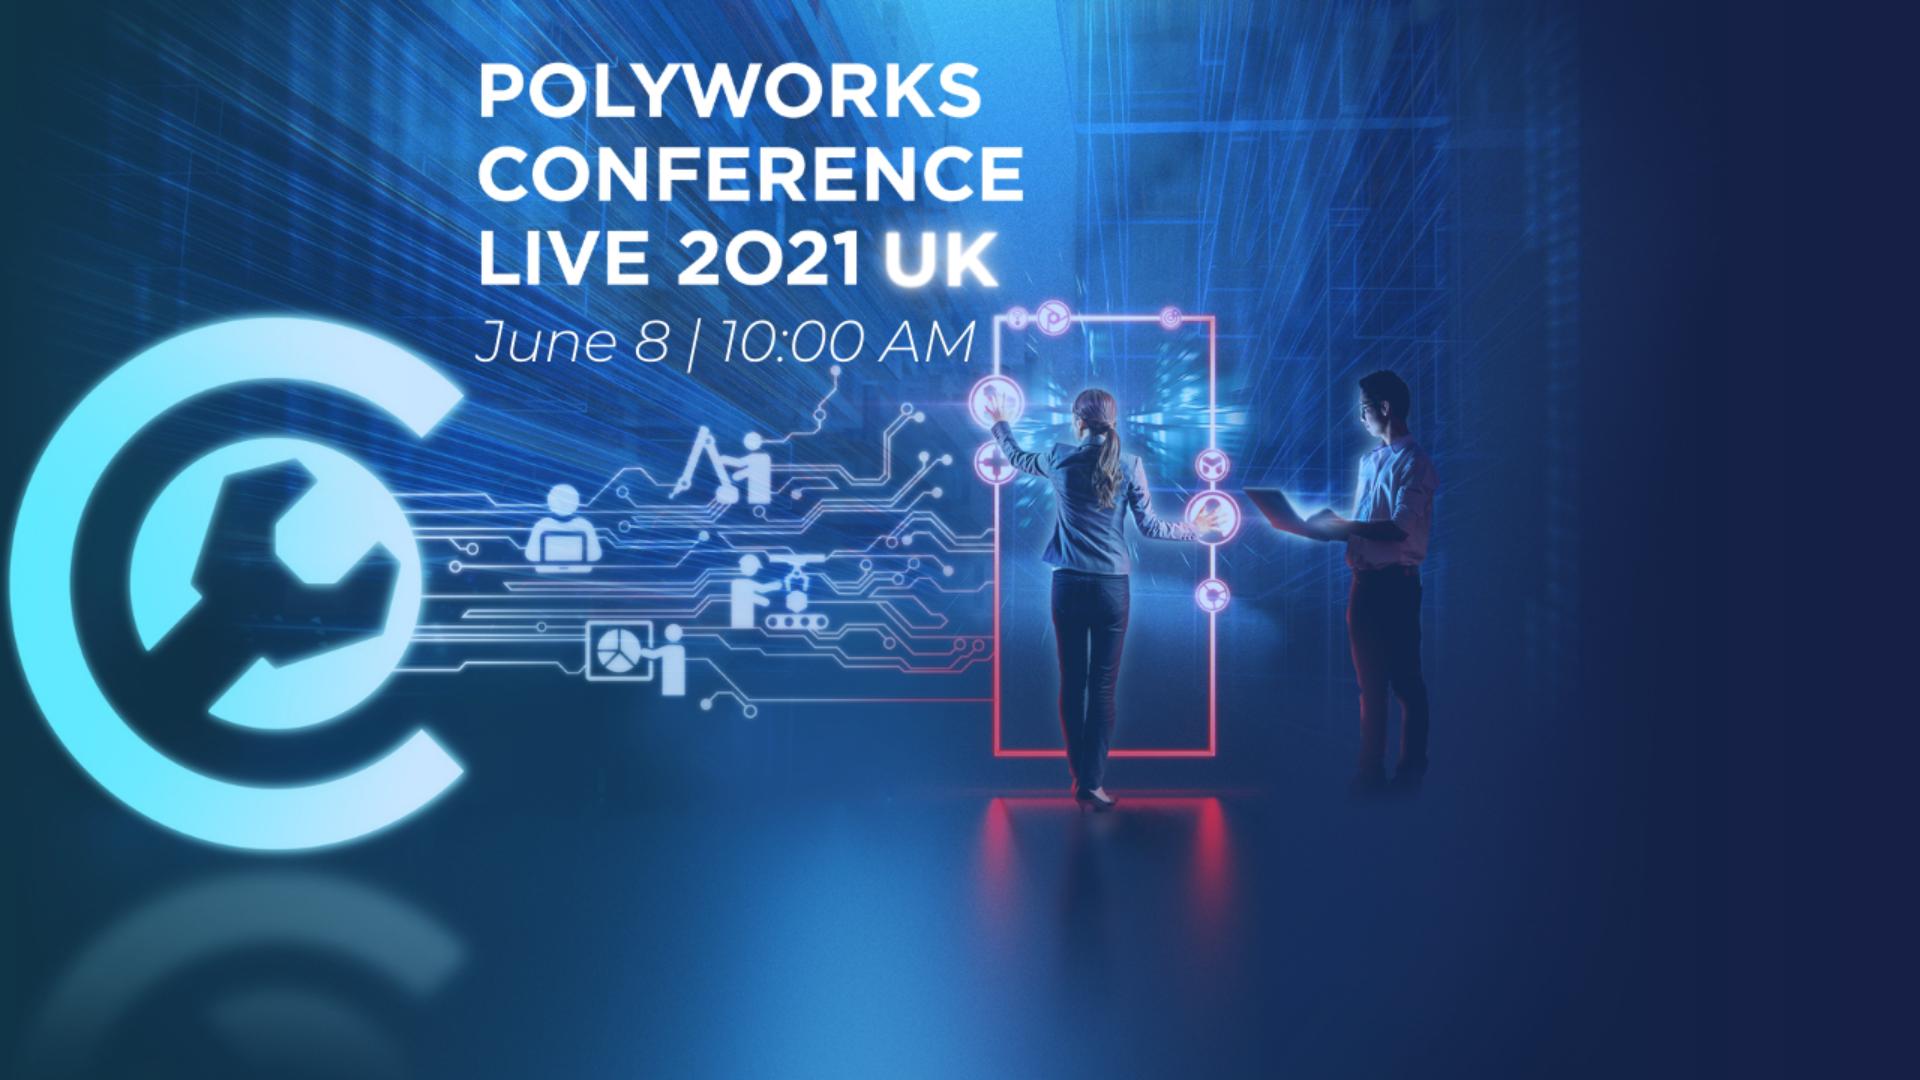 PolyWorks® Conference Live 2021 UK